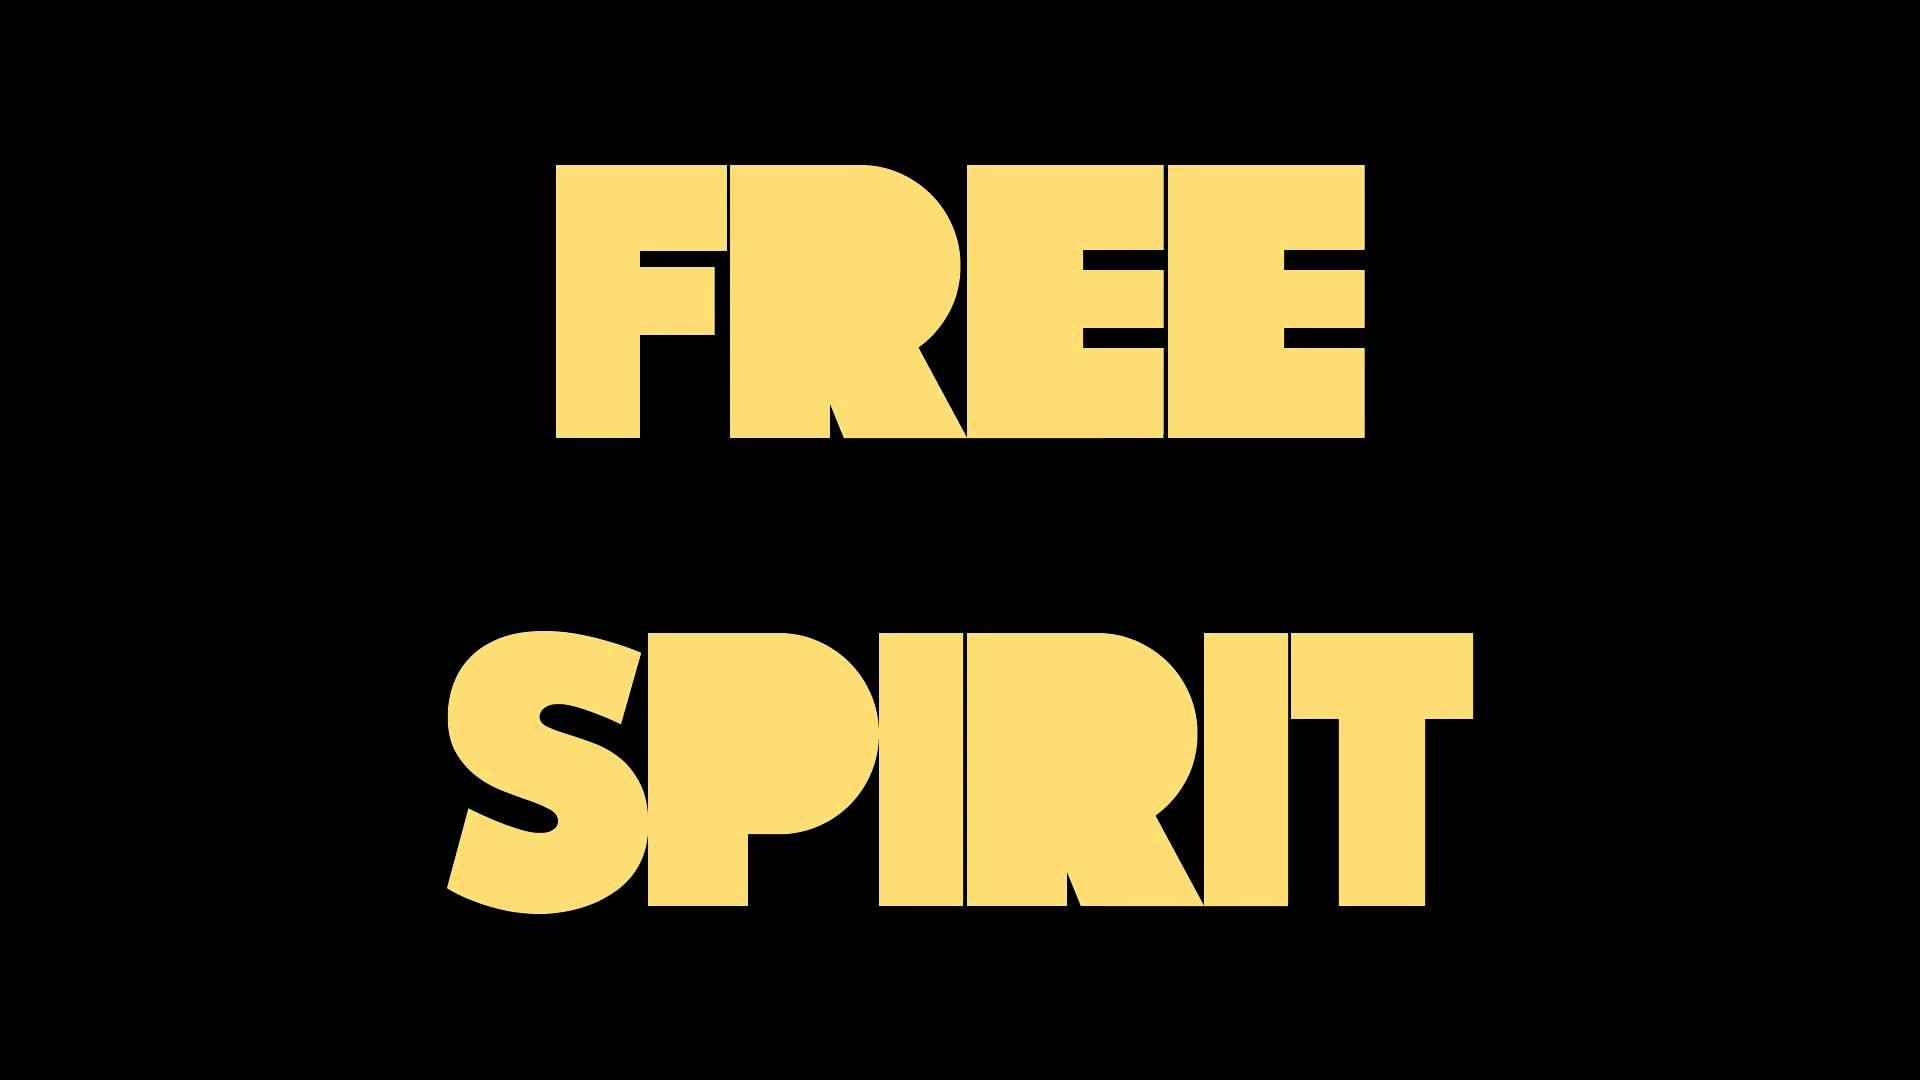 Drake Waterfowl Wallpaper – WallpaperSafari | Free Wallpapers | Pinterest |  Wallpaper